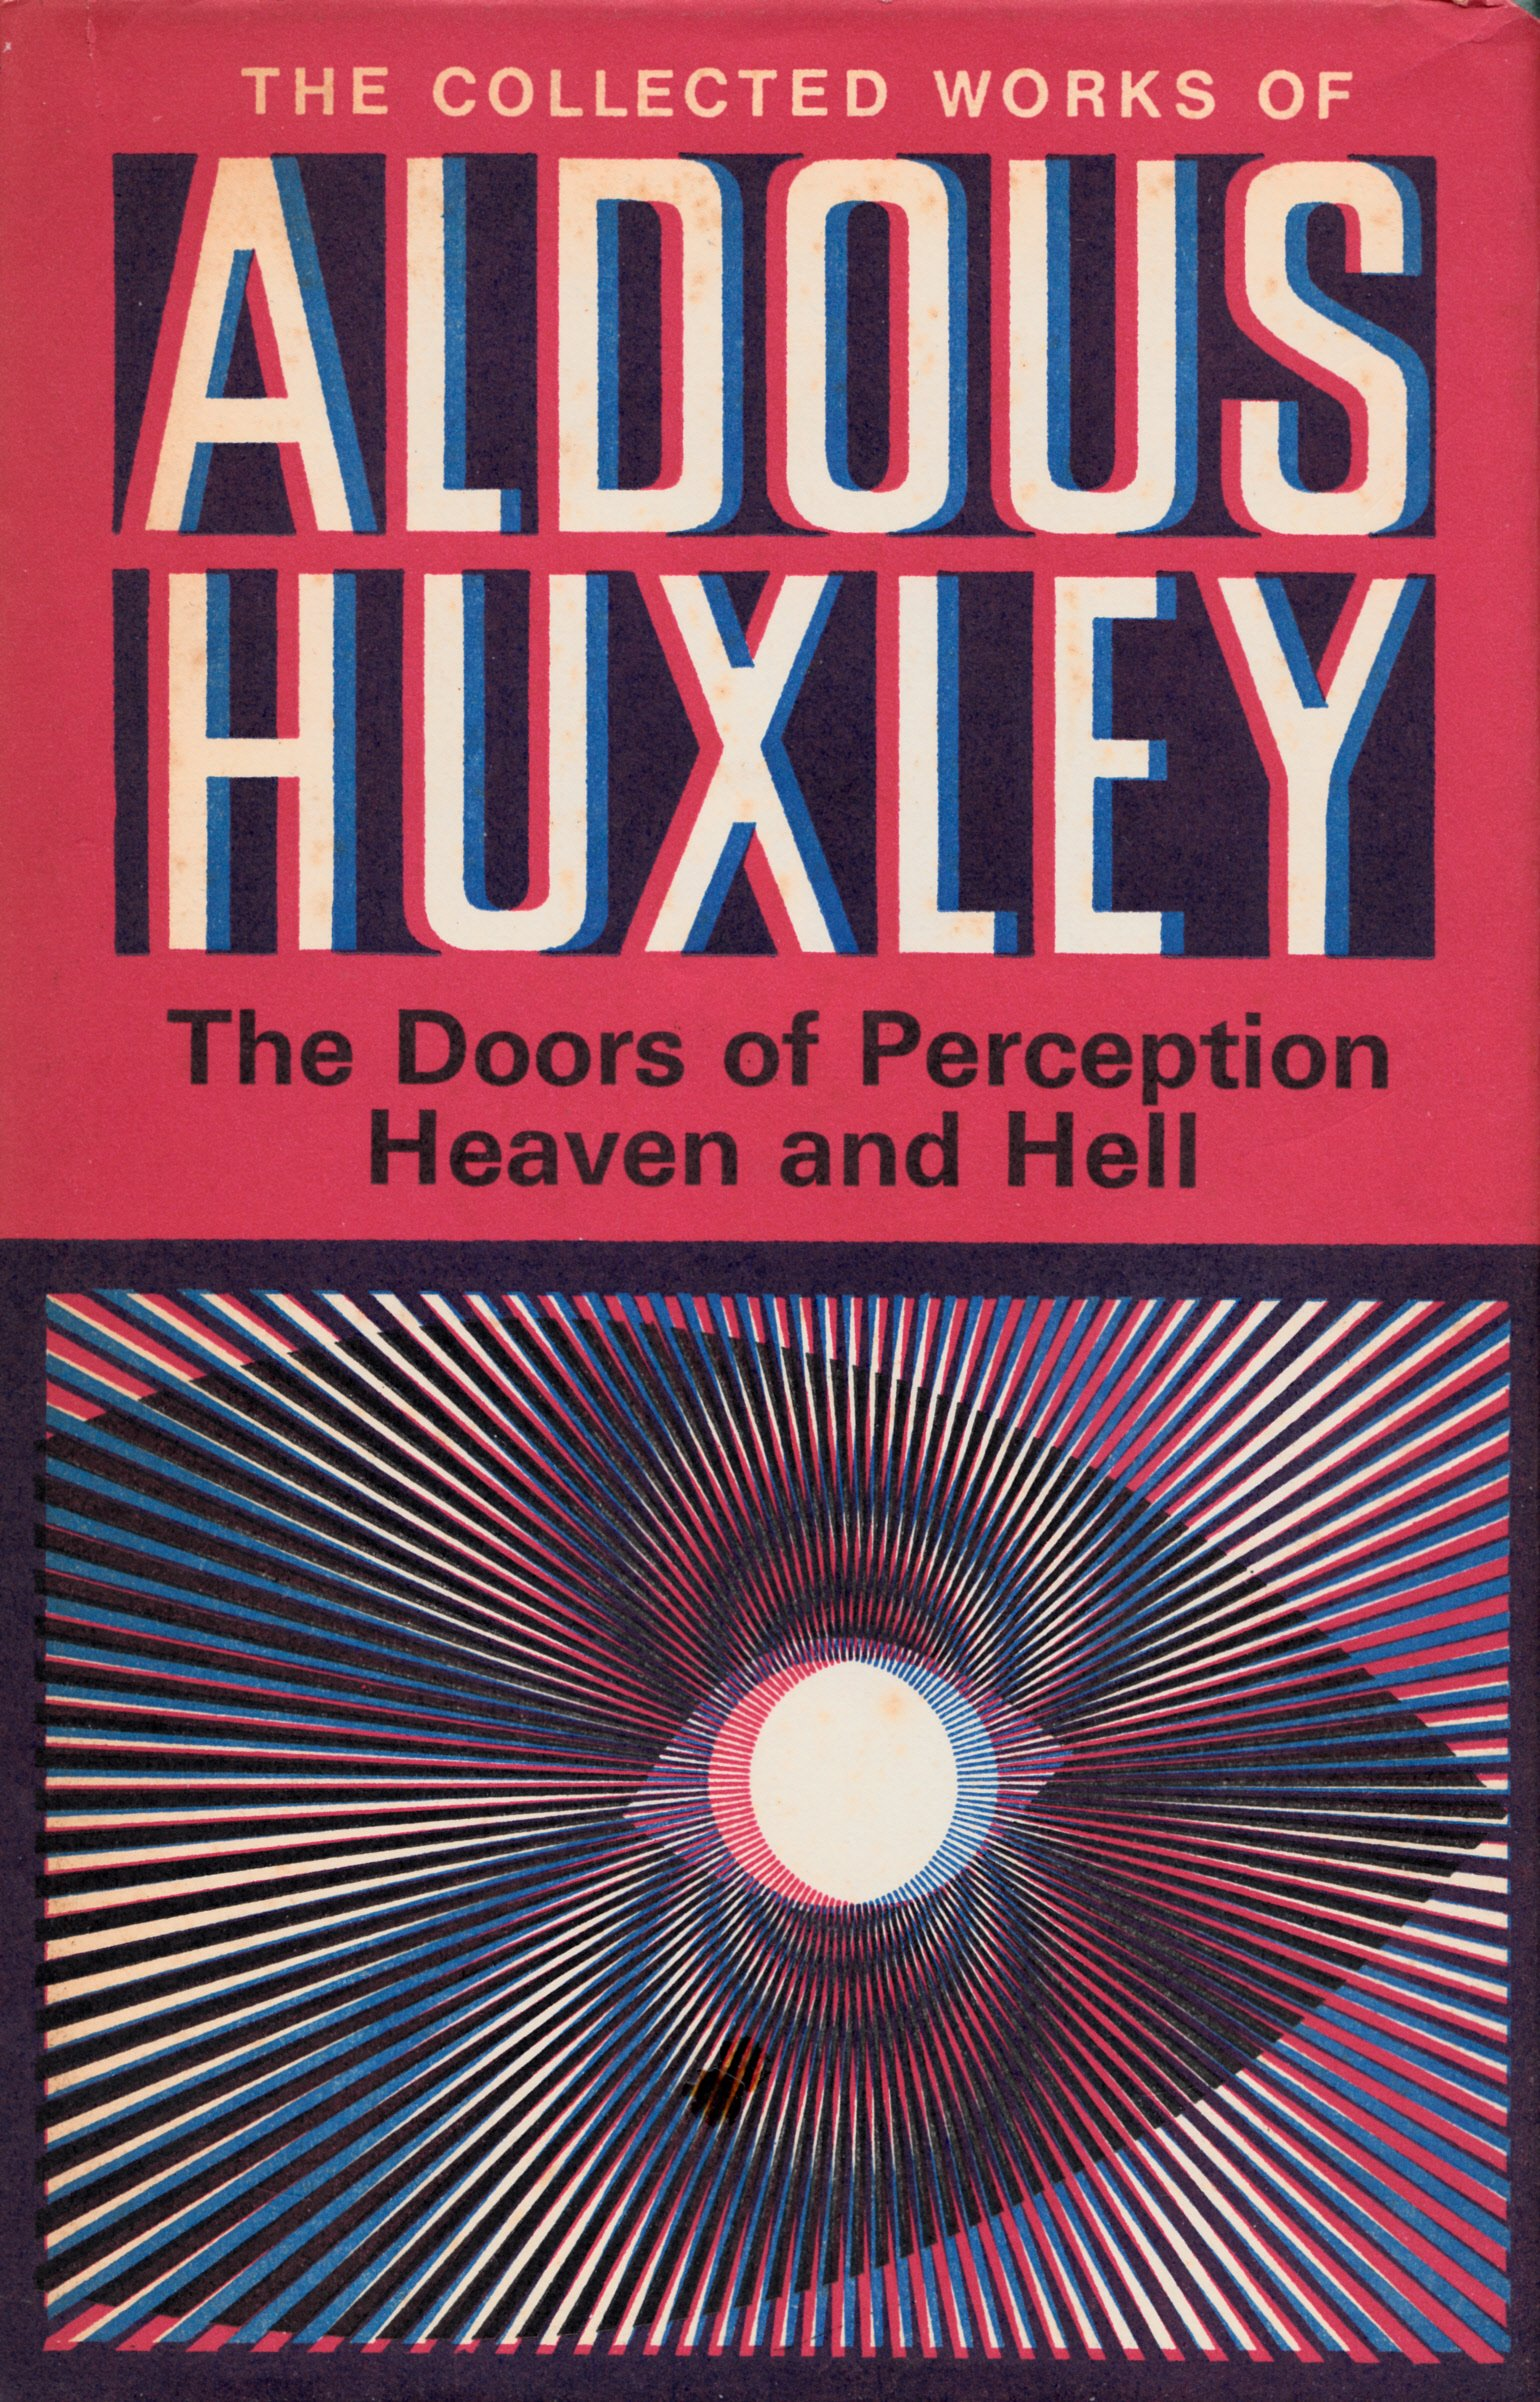 aldous huxley doors of perception